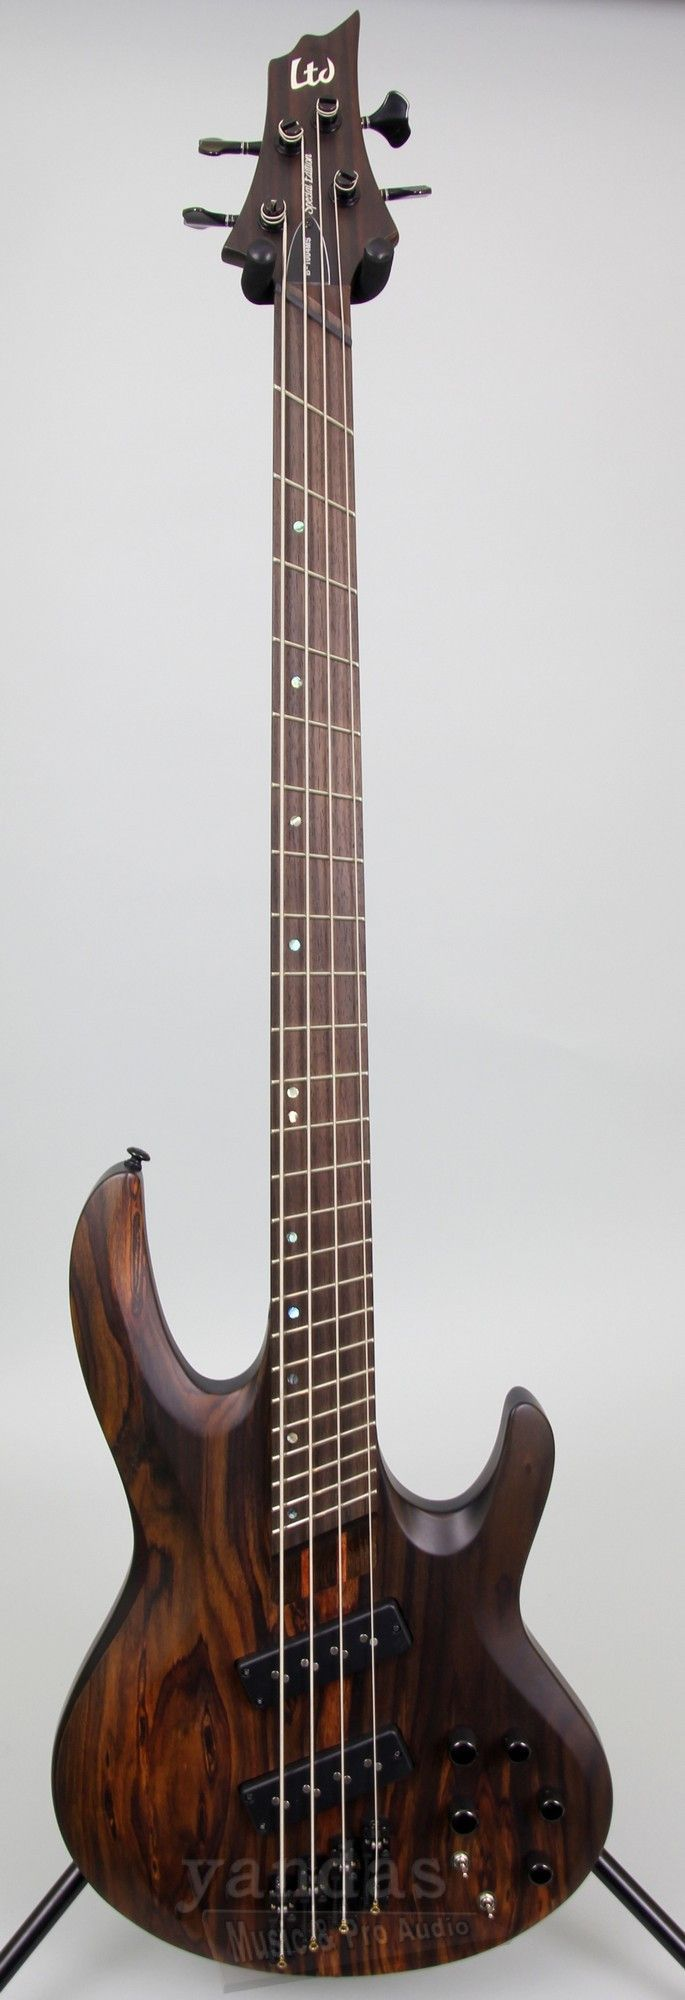 store demo ltd b 1004se multi scale bass guitar right handed guitars bass in 2019. Black Bedroom Furniture Sets. Home Design Ideas